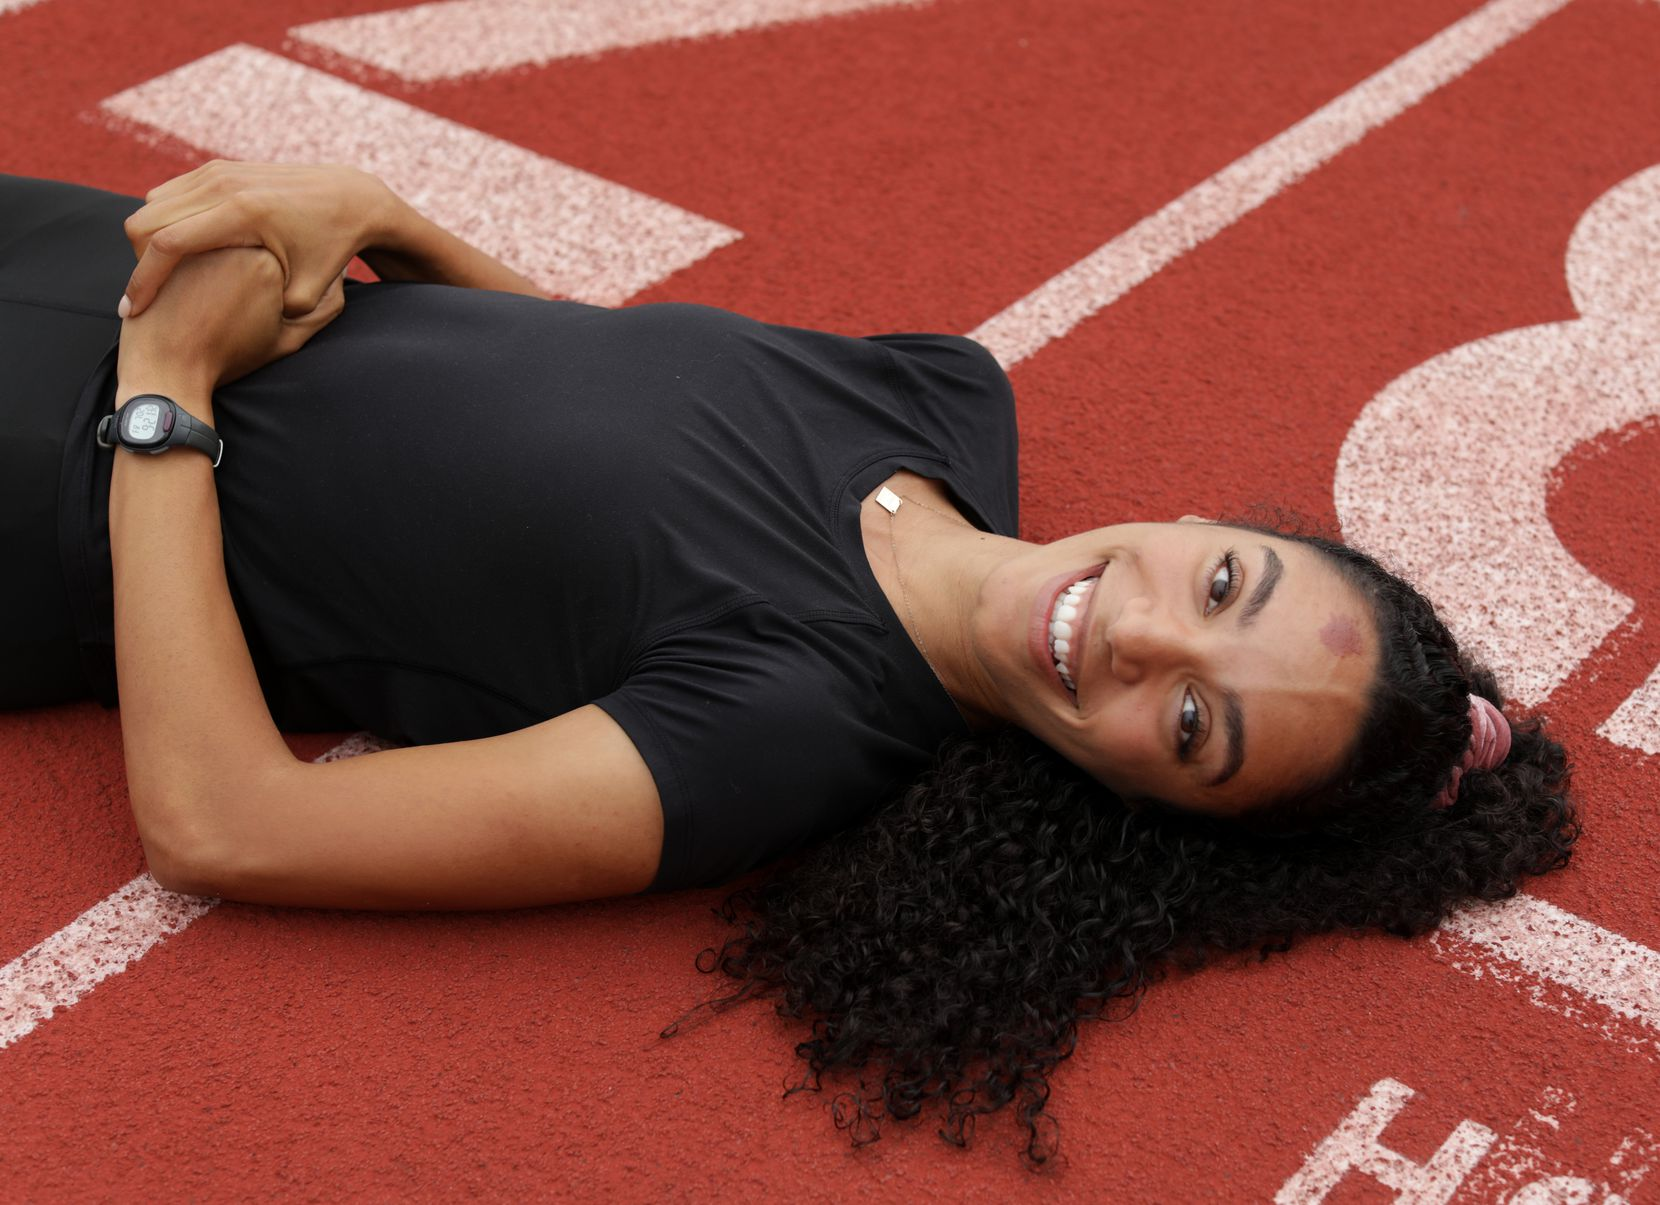 Melissa Gonzalez poses for a photograph at Standridge Stadium in Carrollton, TX, on Jul. 2, 2021.  (Jason Janik/Special Contributor)